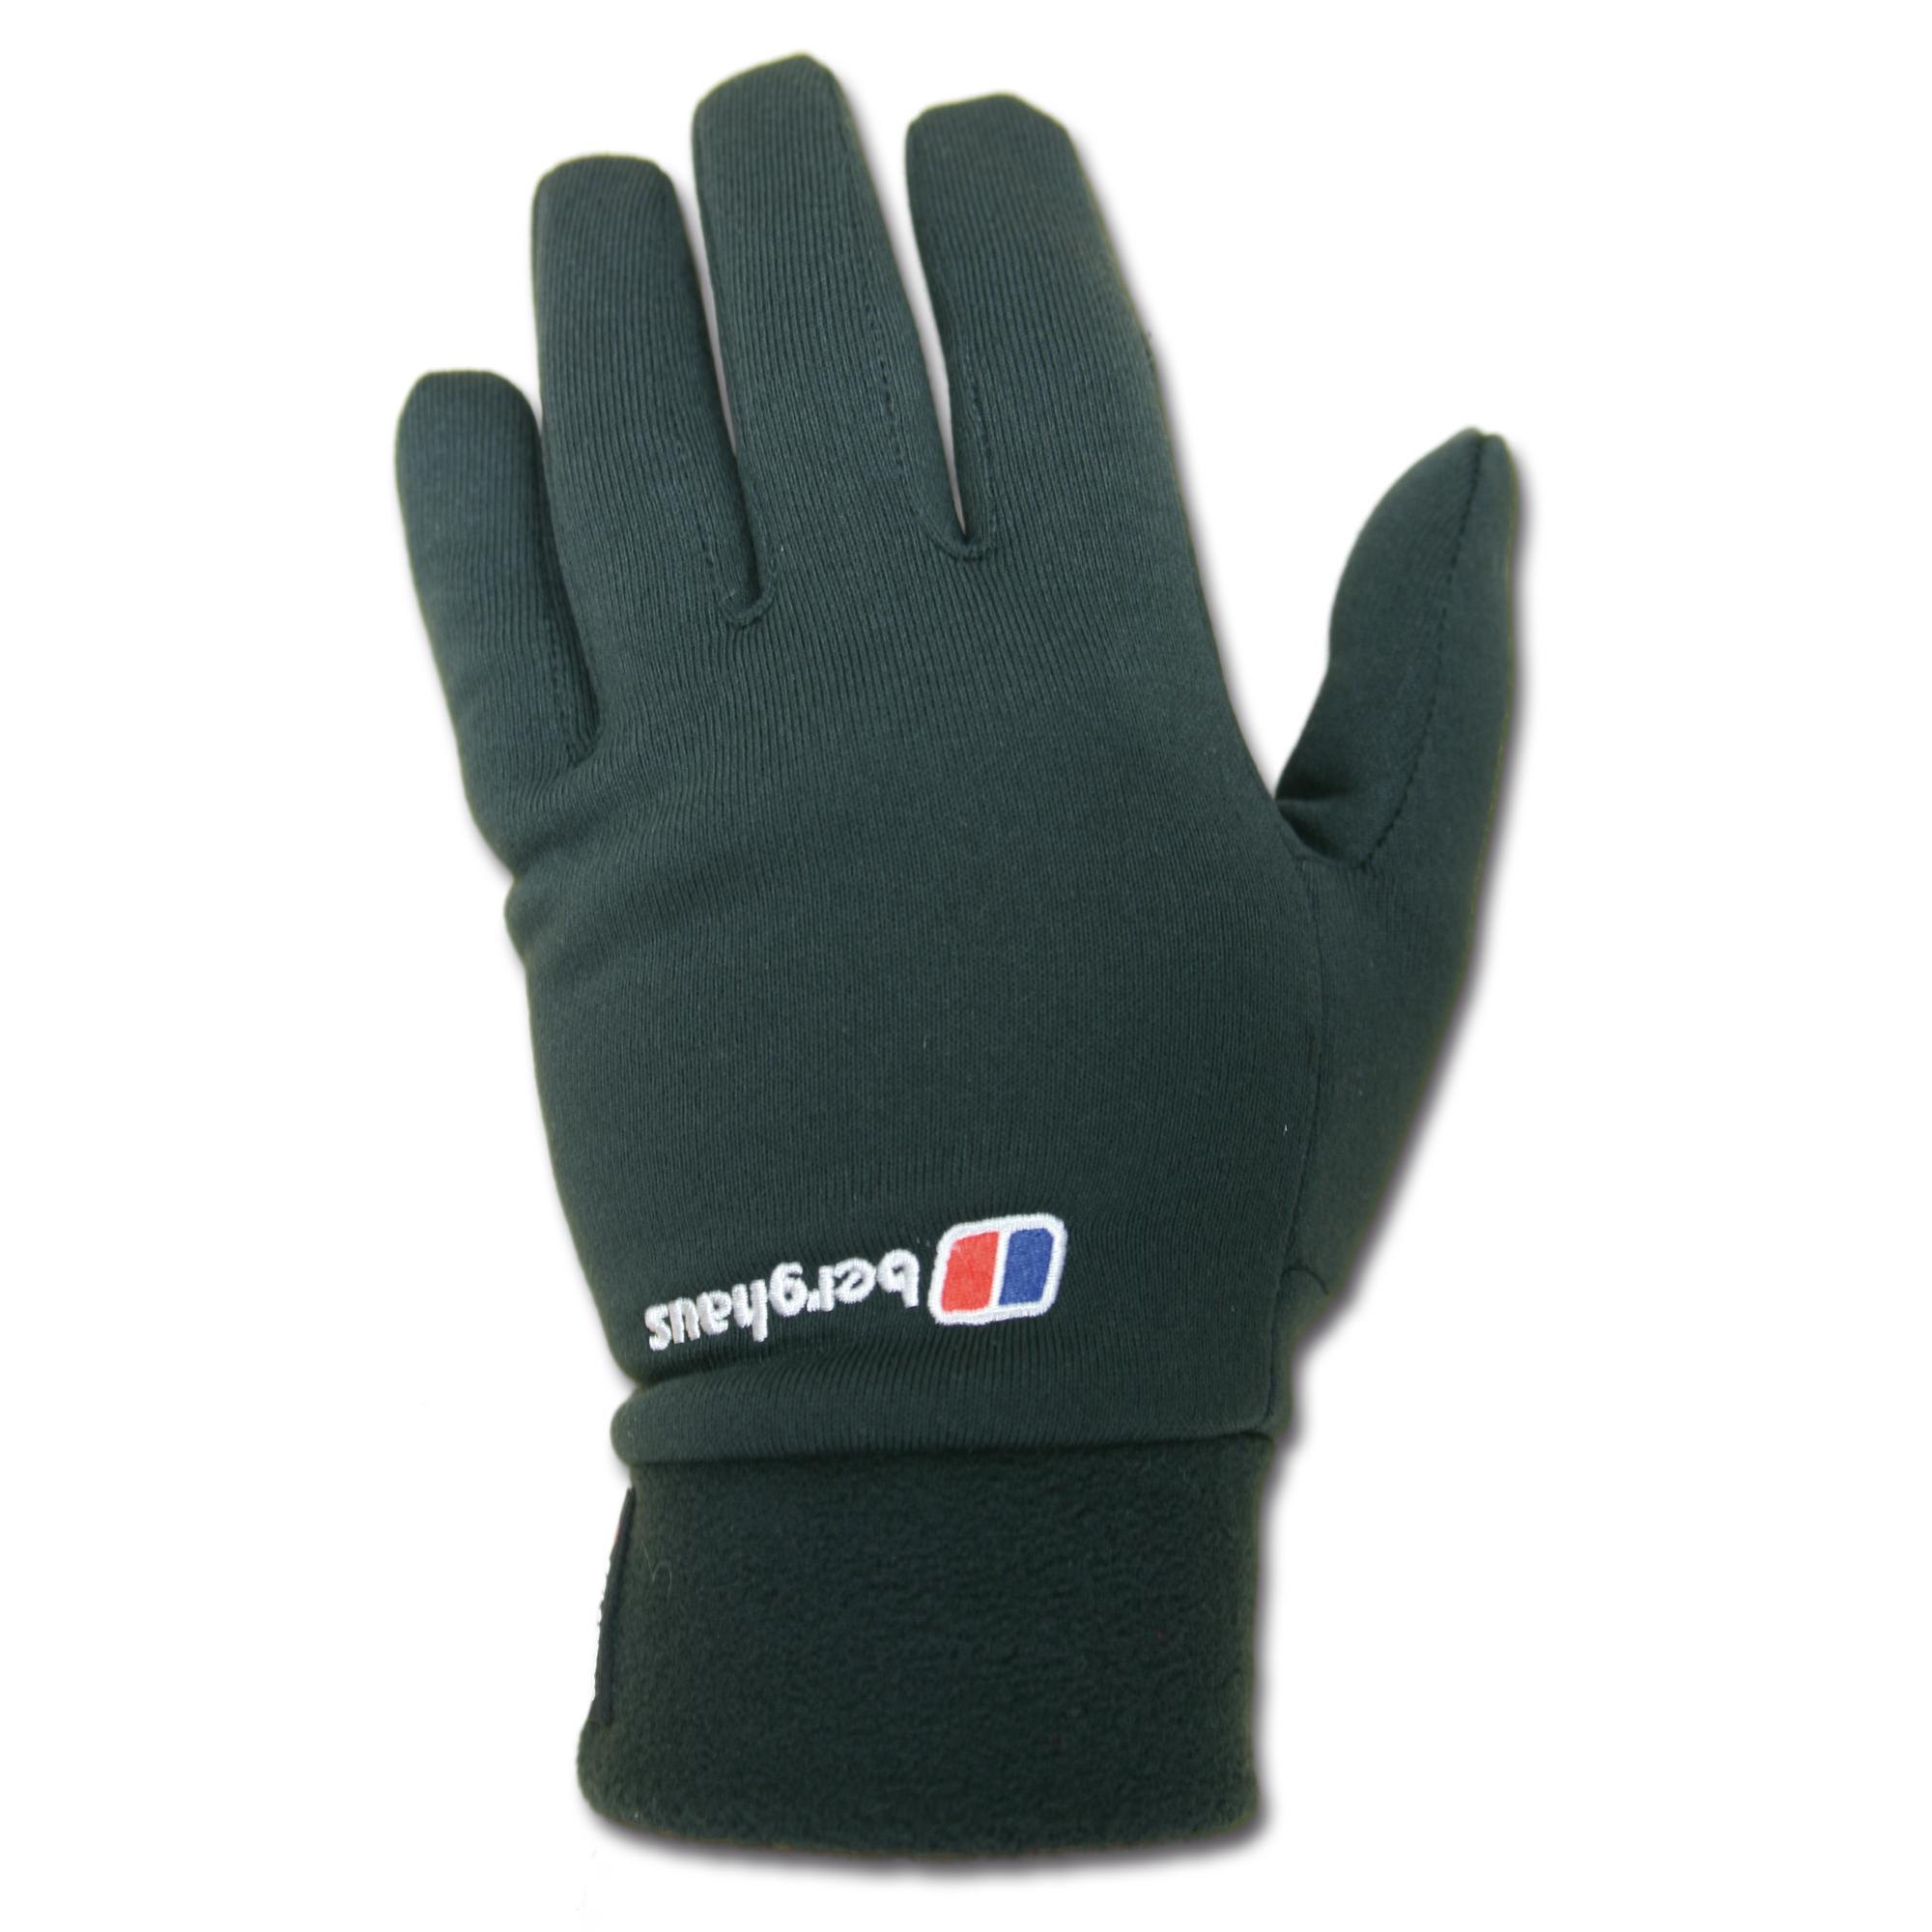 Berghaus Liner Handschuh